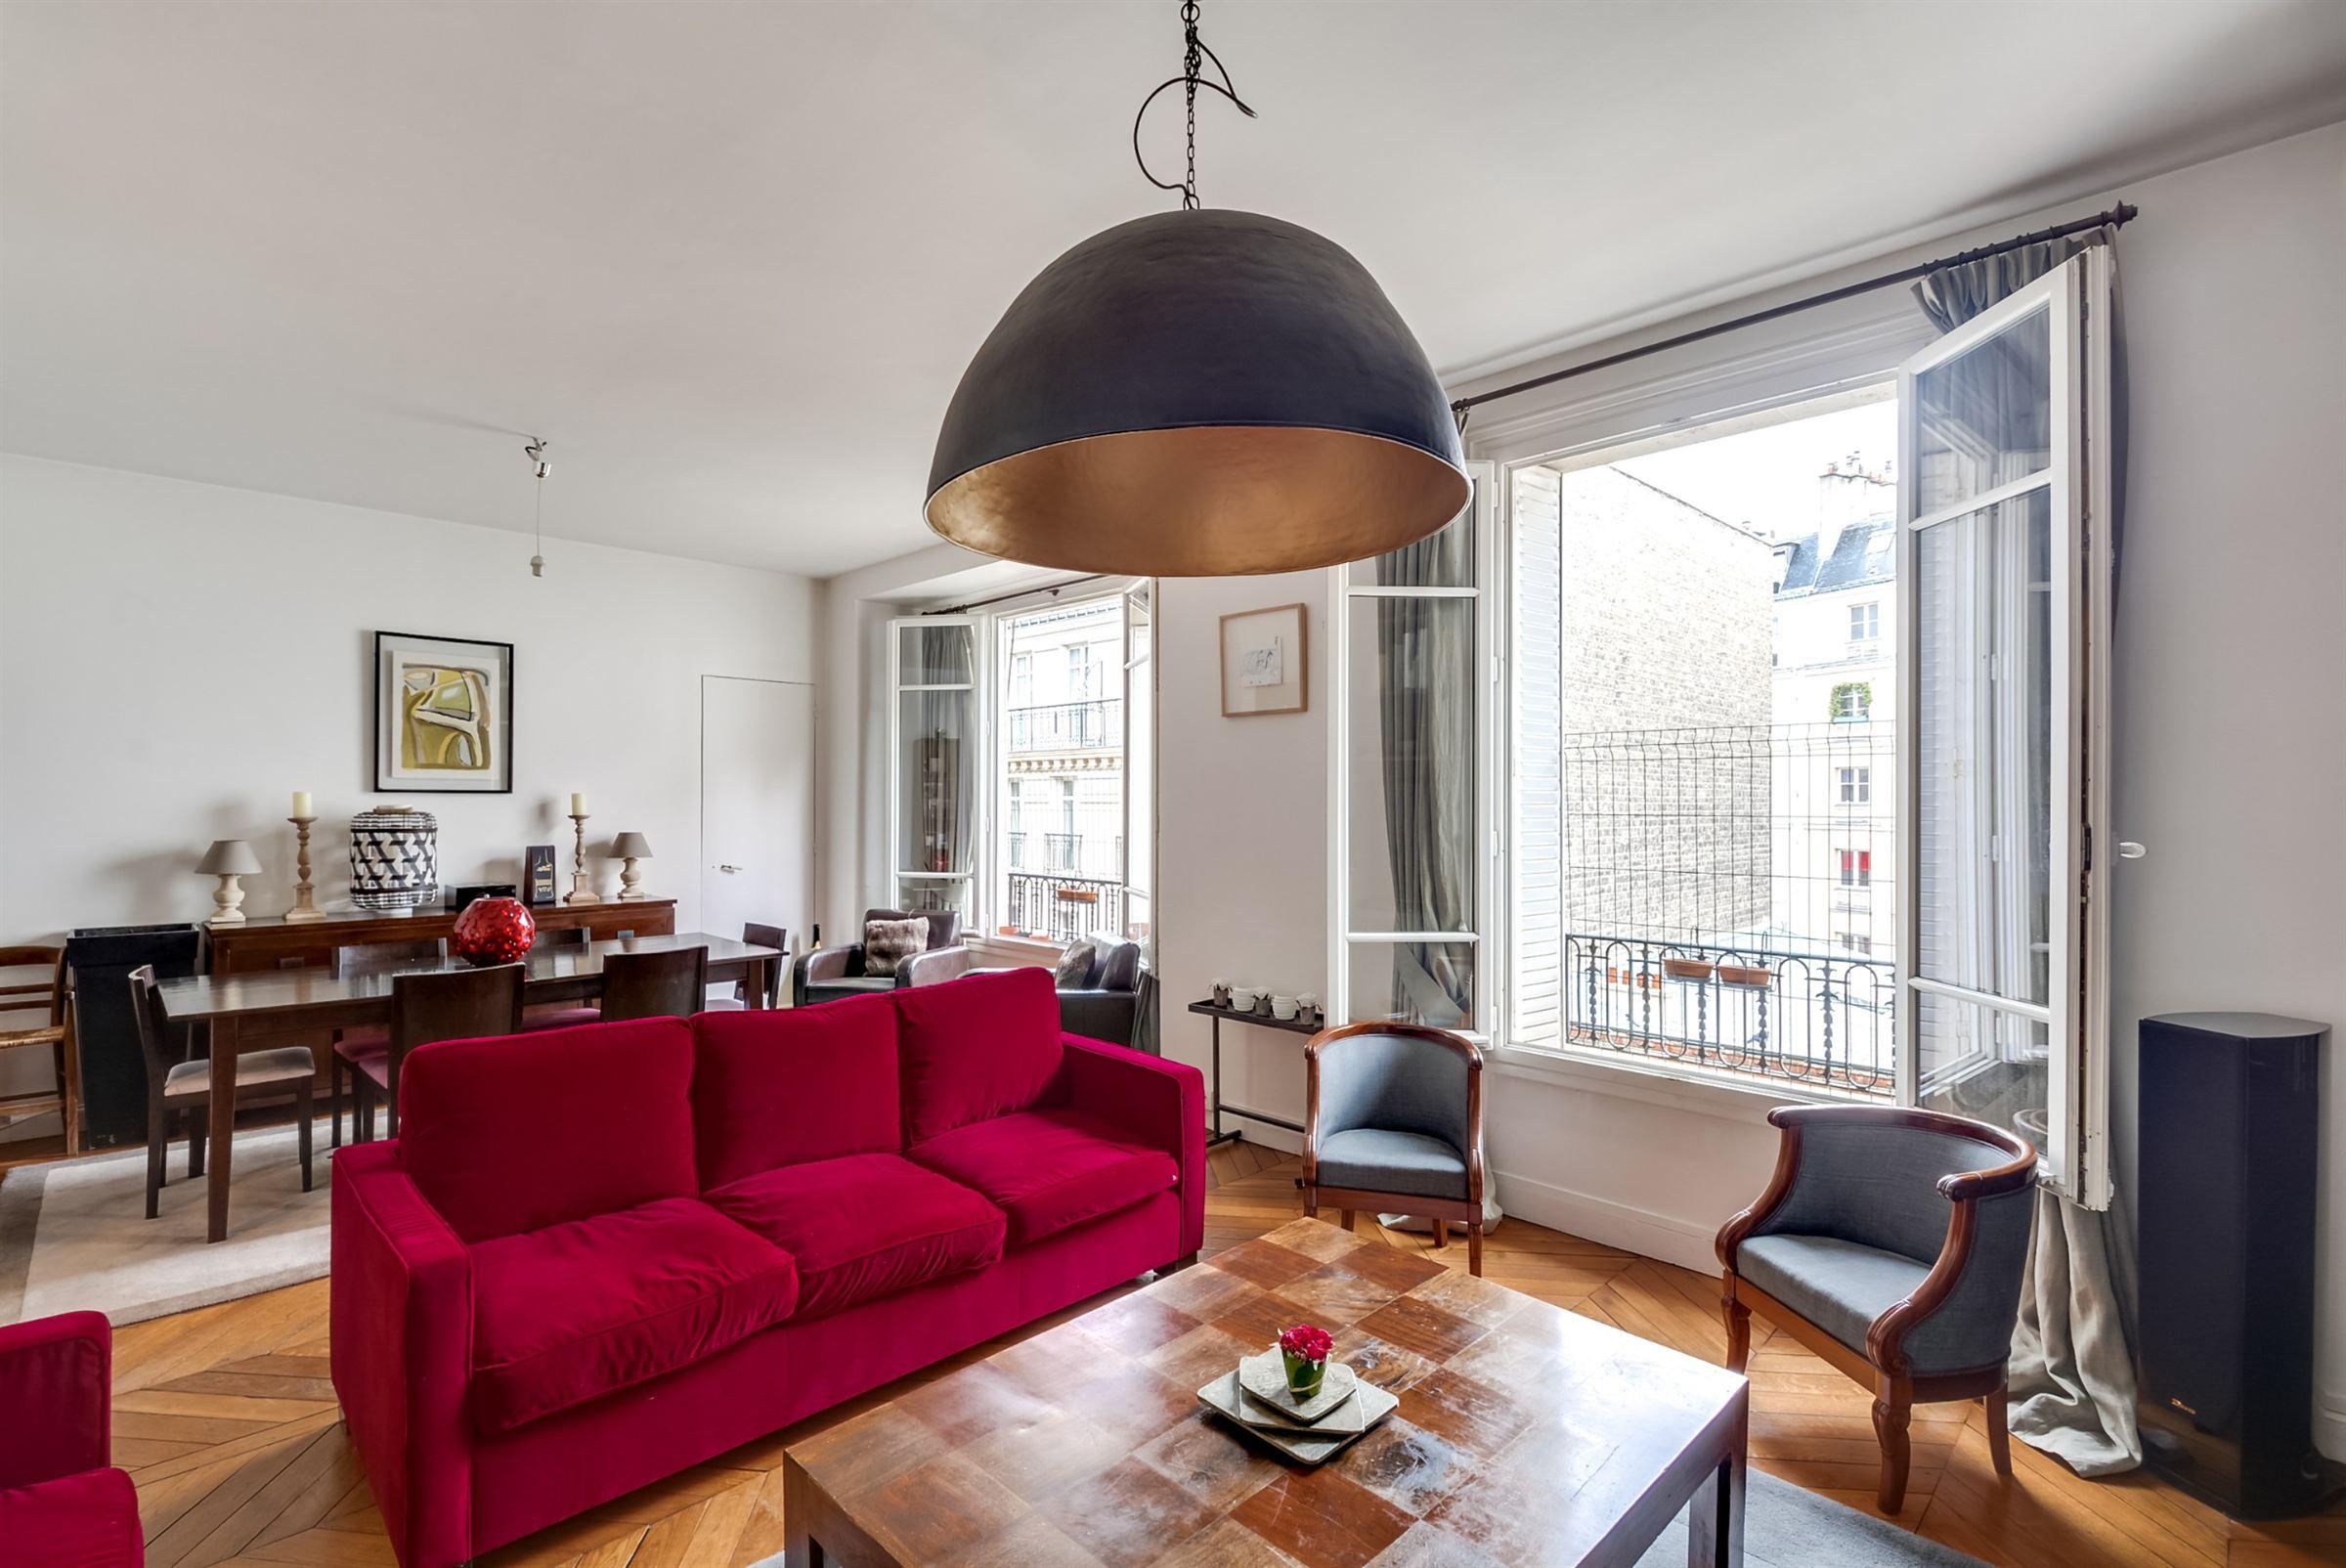 Apartamento por un Venta en Paris 16 - Chaussée de la Muette. Quiet environment, unobstructed apartment. Paris, Paris 75116 Francia